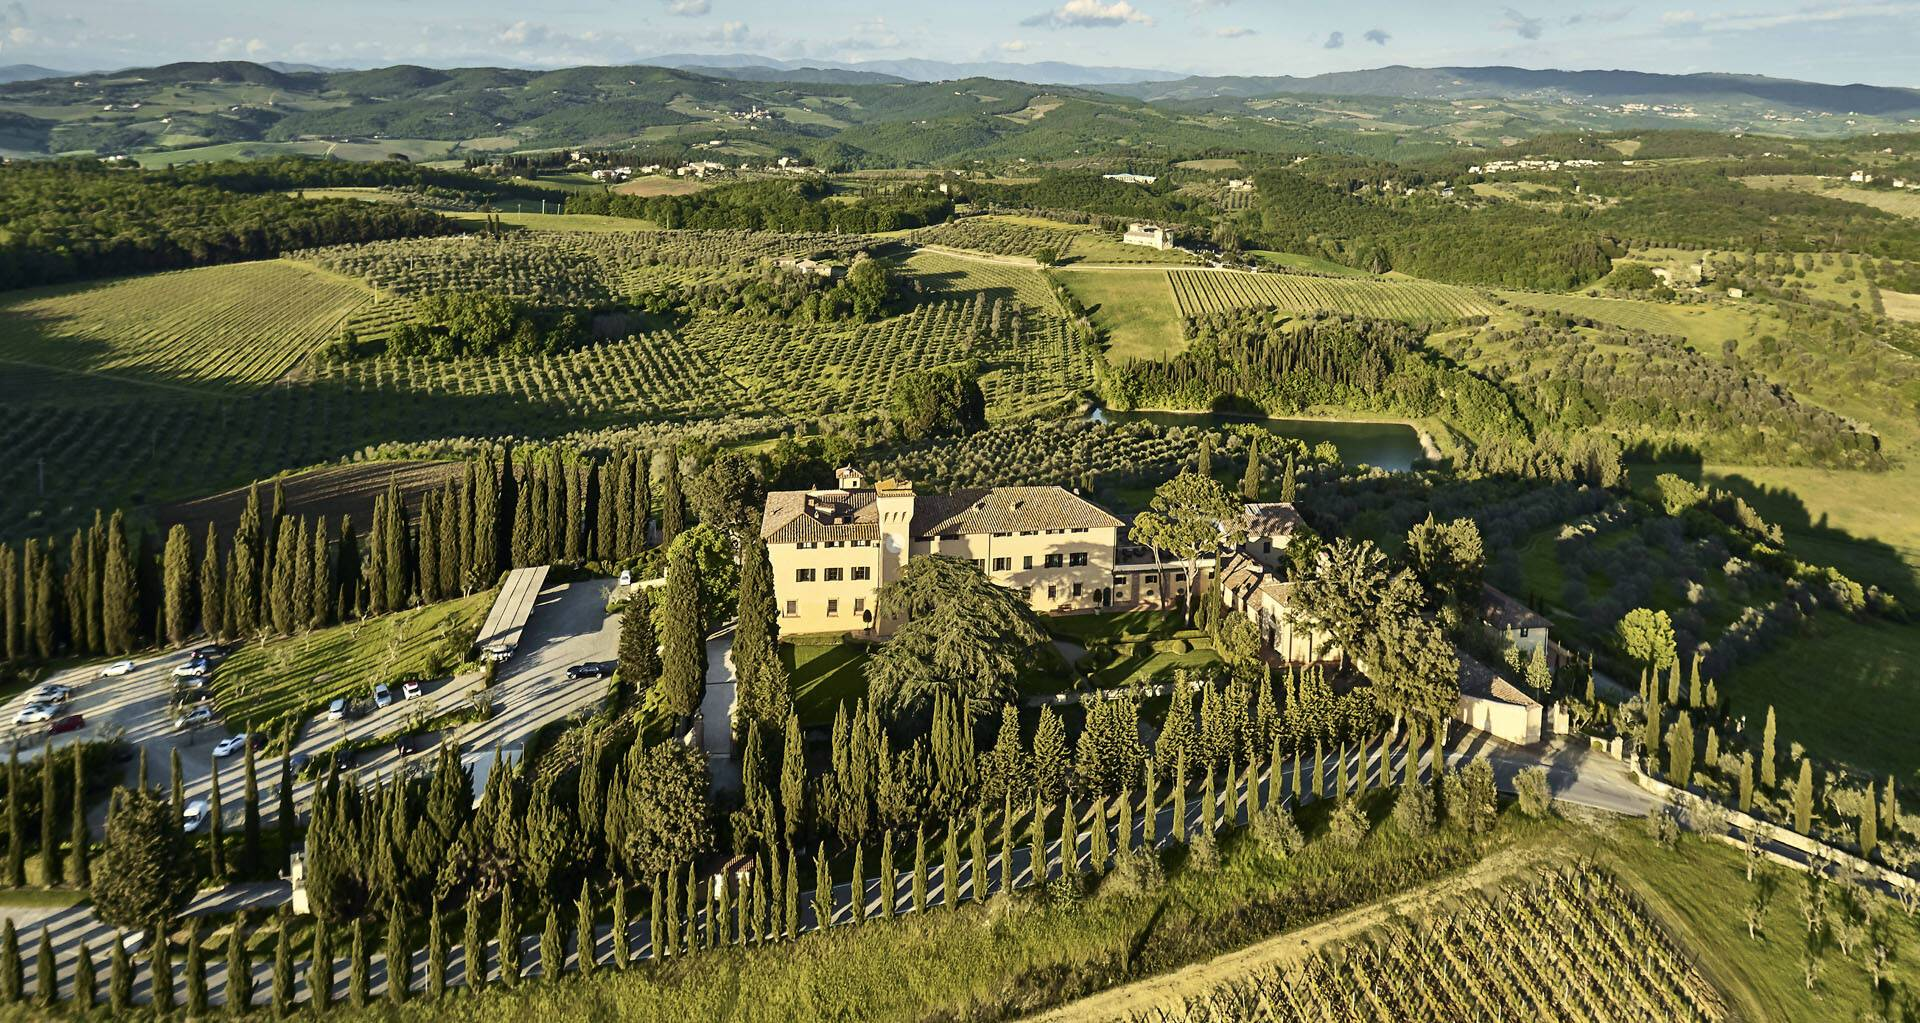 Como Castello del Nero Toscane Paysages